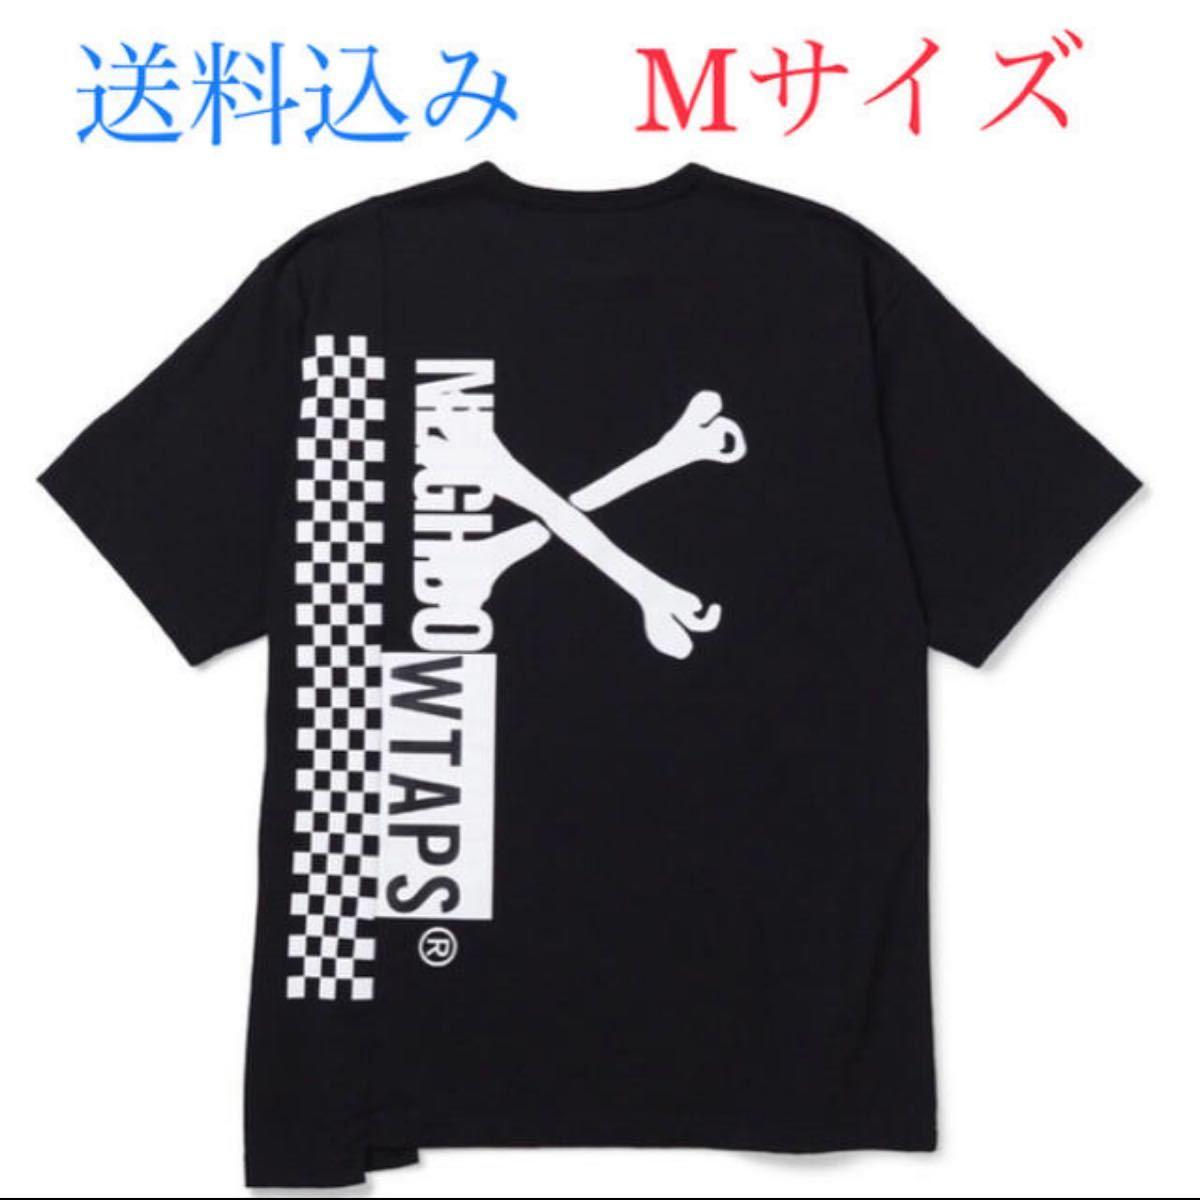 M wtaps neighborhood コラボ Tシャツ